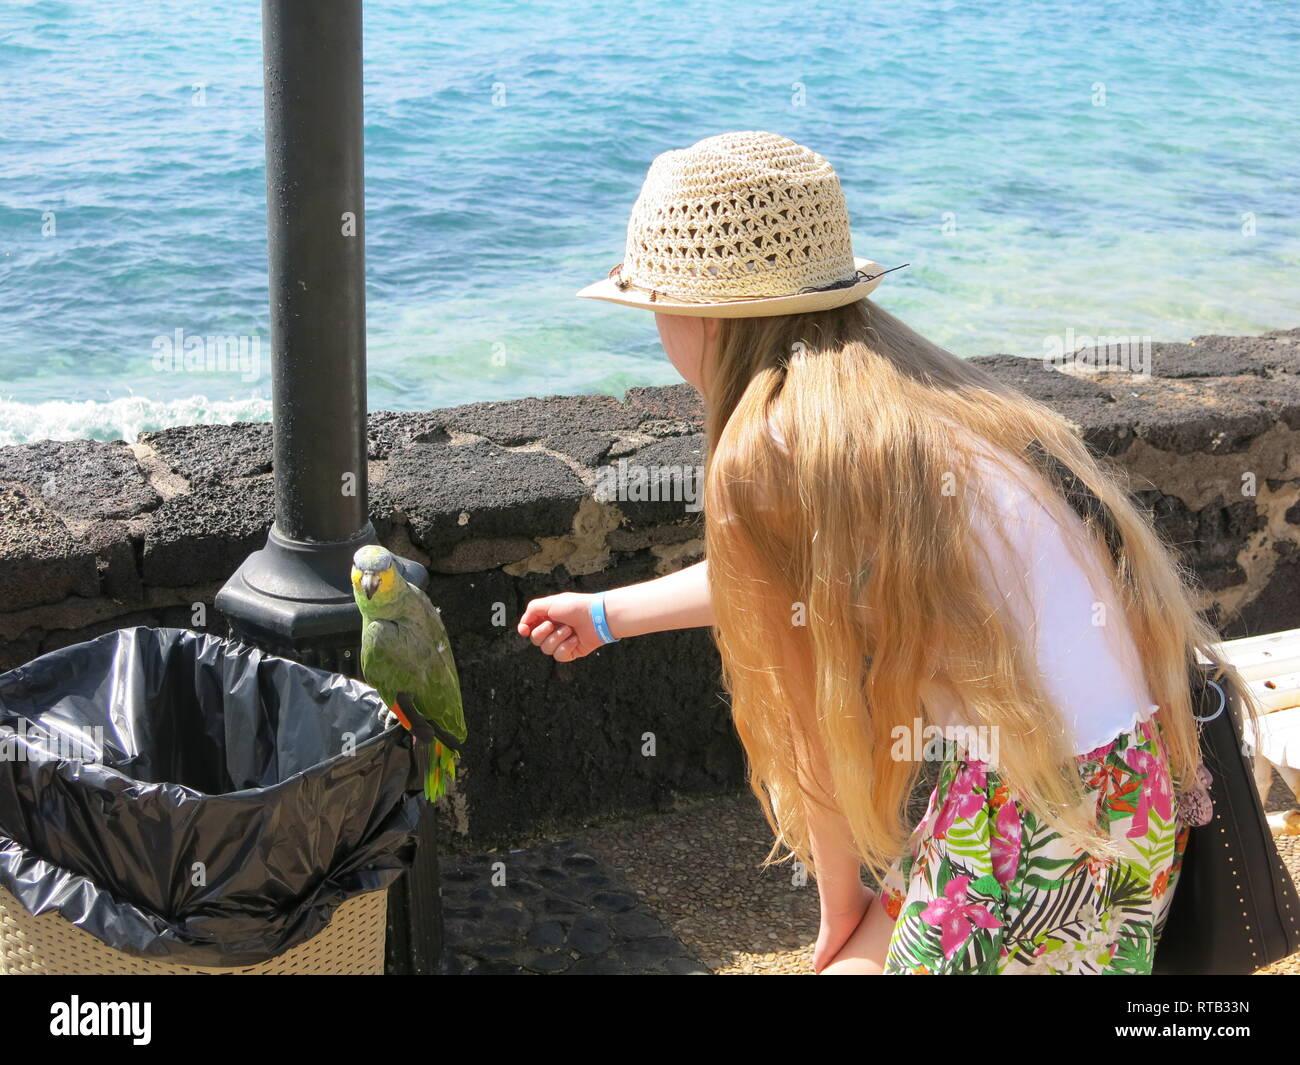 contatti donne lanzarote playa honda donne belle ucraino